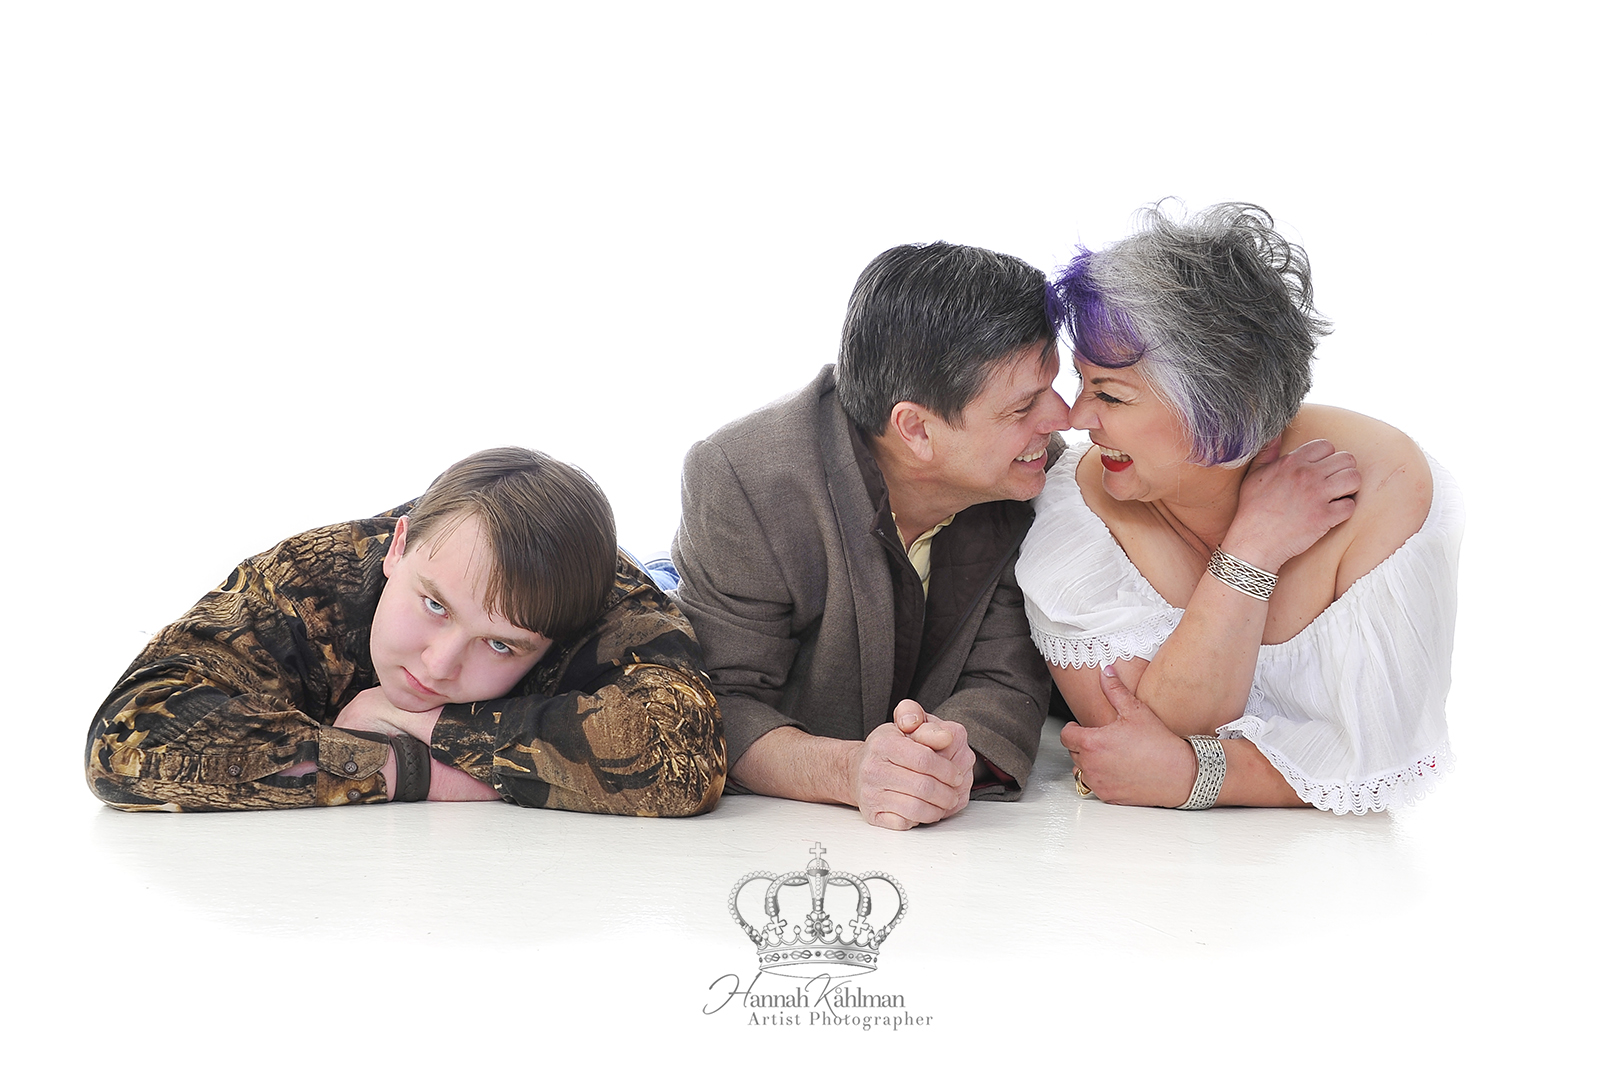 Funny_and_romantic_family_photo_in_studi